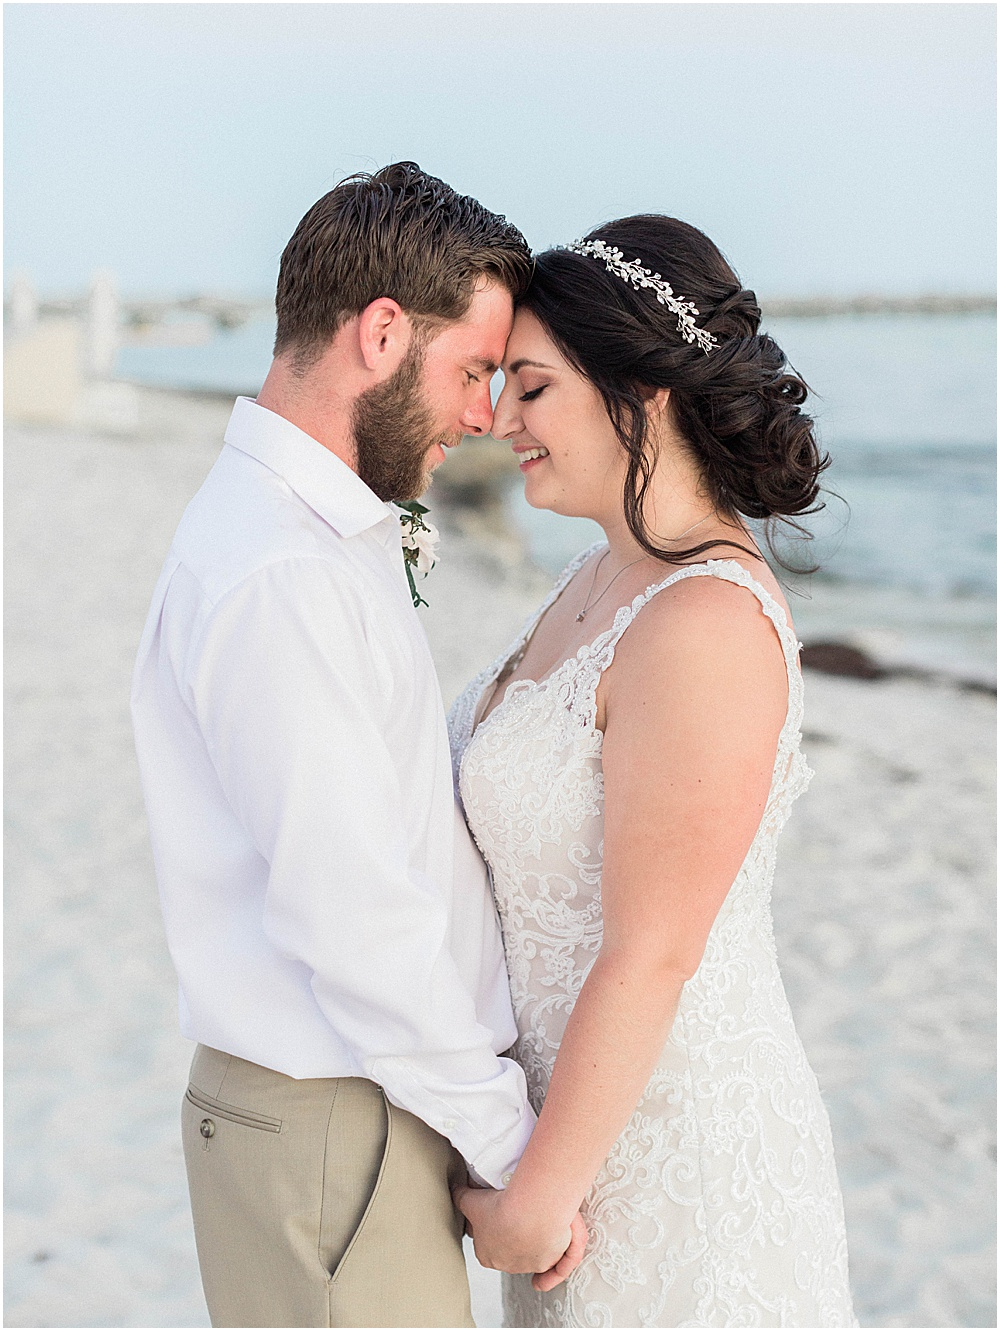 casa_marina_key_west_florida_destination_palm_trees_boston_wedding_photographer_meredith_jane_photography_photo_0118.jpg